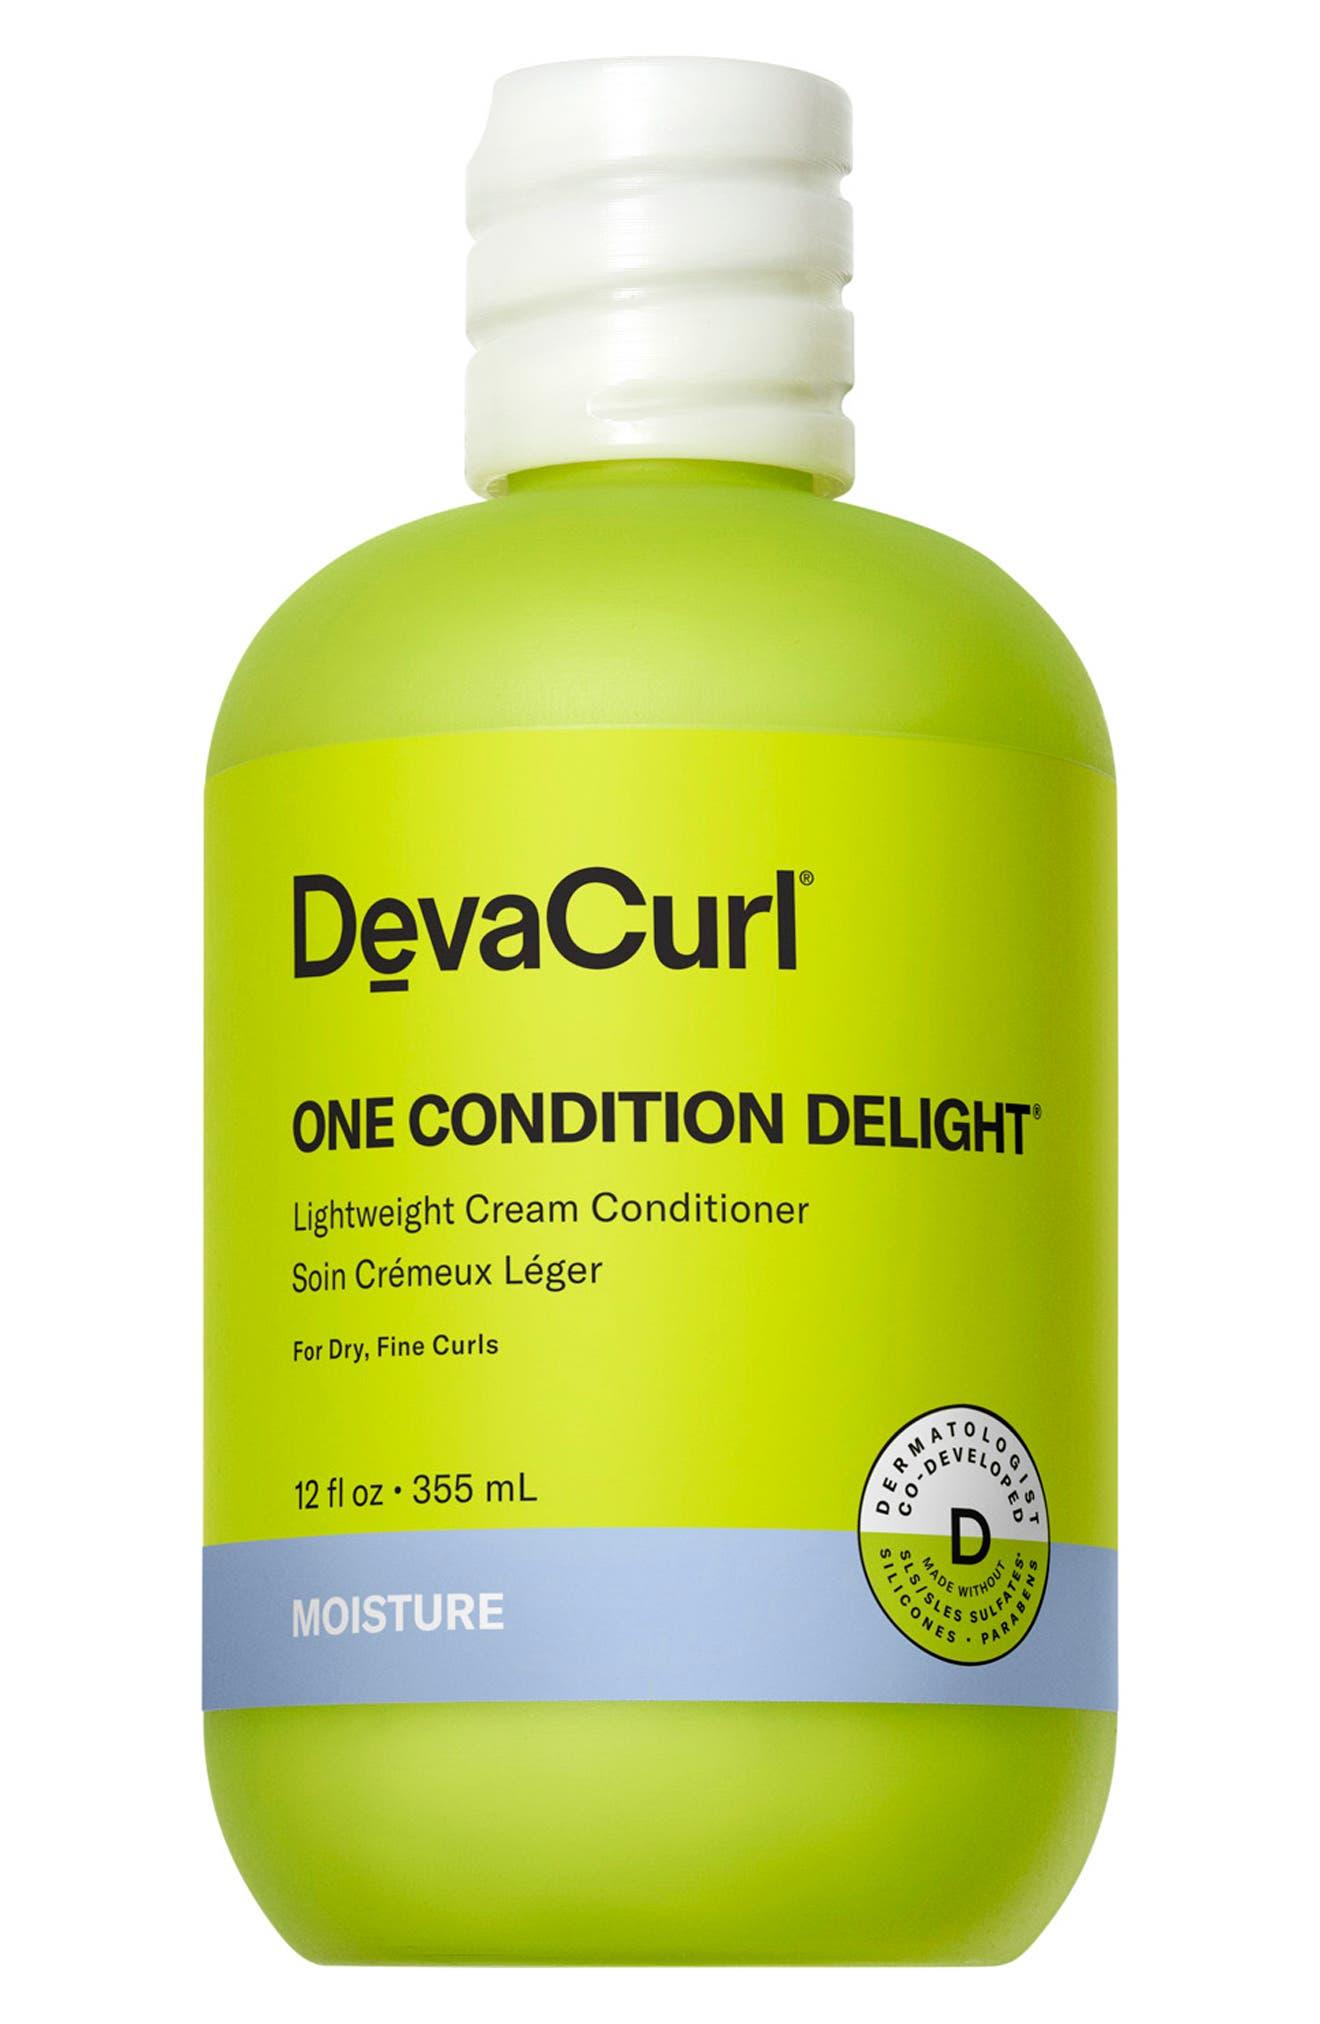 One Condition Delight Lightweight Cream Conditioner